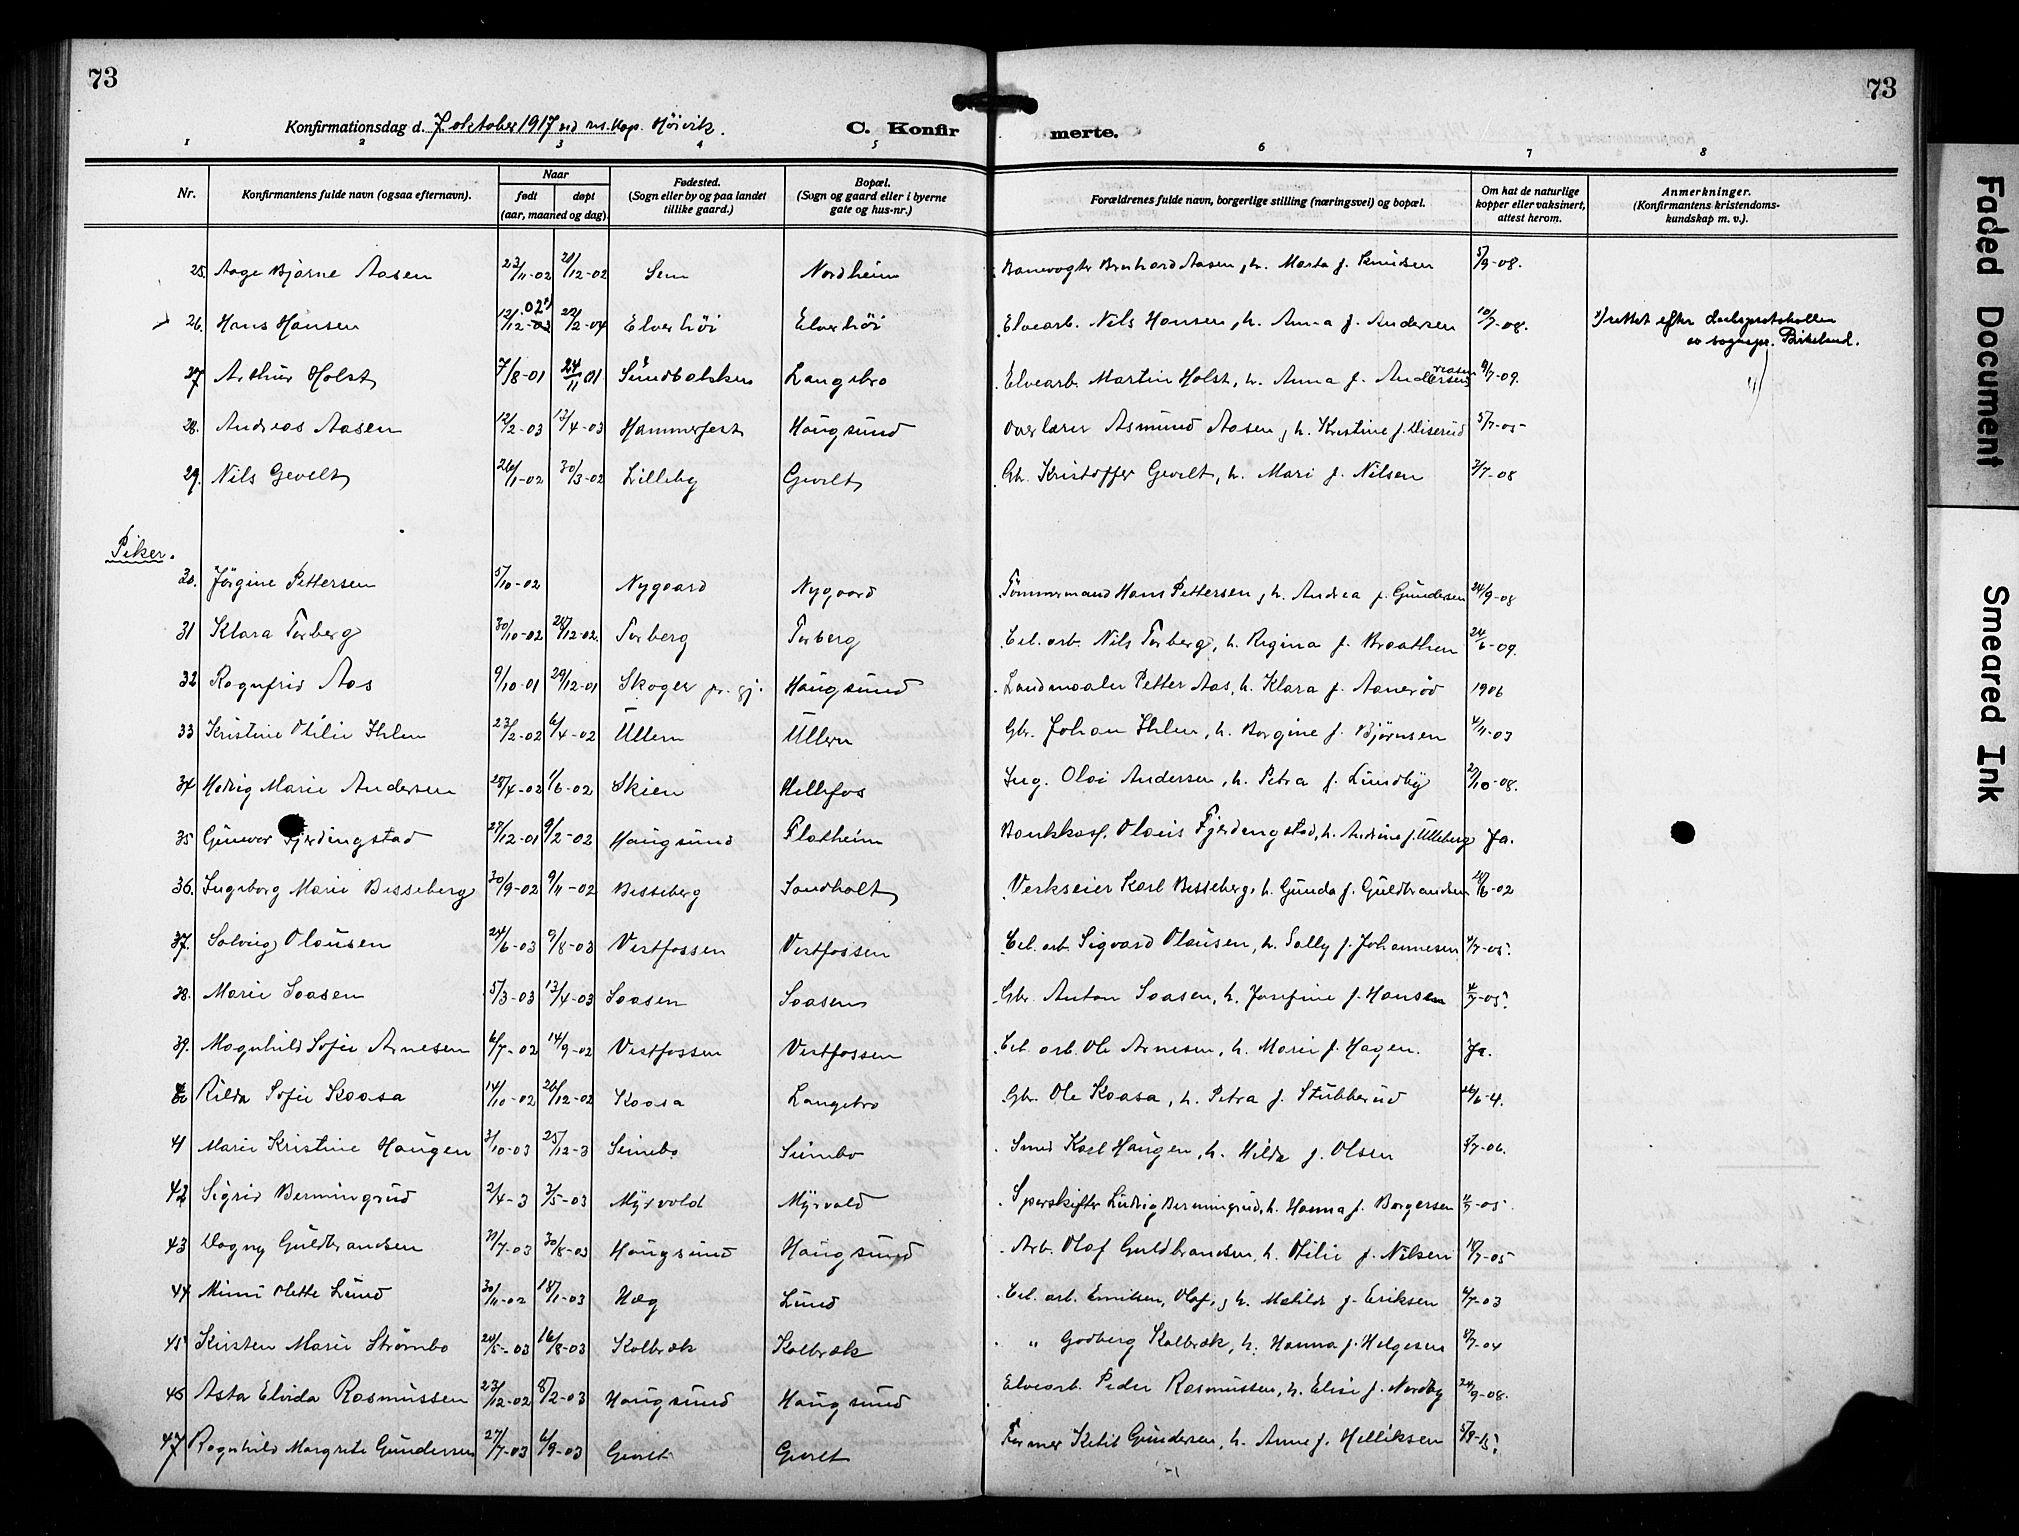 SAKO, Eiker kirkebøker, F/Fb/L0006: Ministerialbok nr. II 6, 1908-1928, s. 73